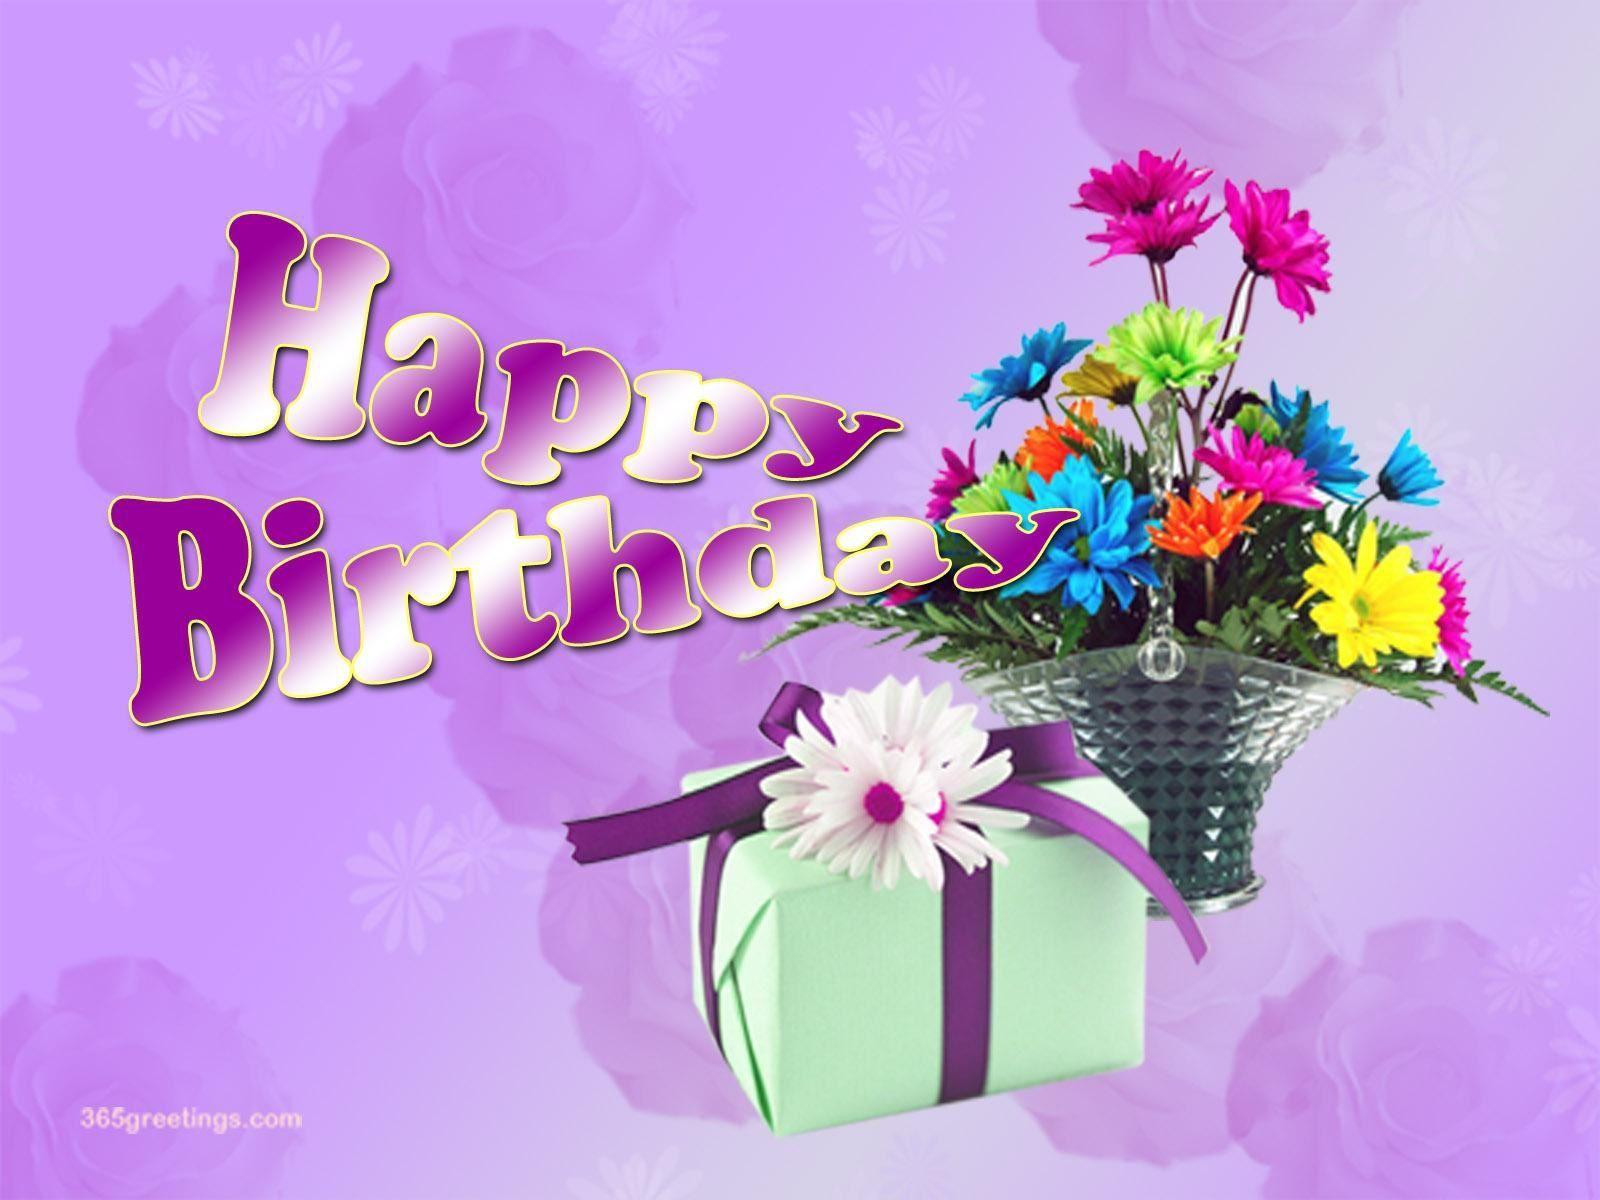 Happy birthday images hd 1200 x 768 google search happy birthday happy birthday images hd 1200 x 768 google search izmirmasajfo